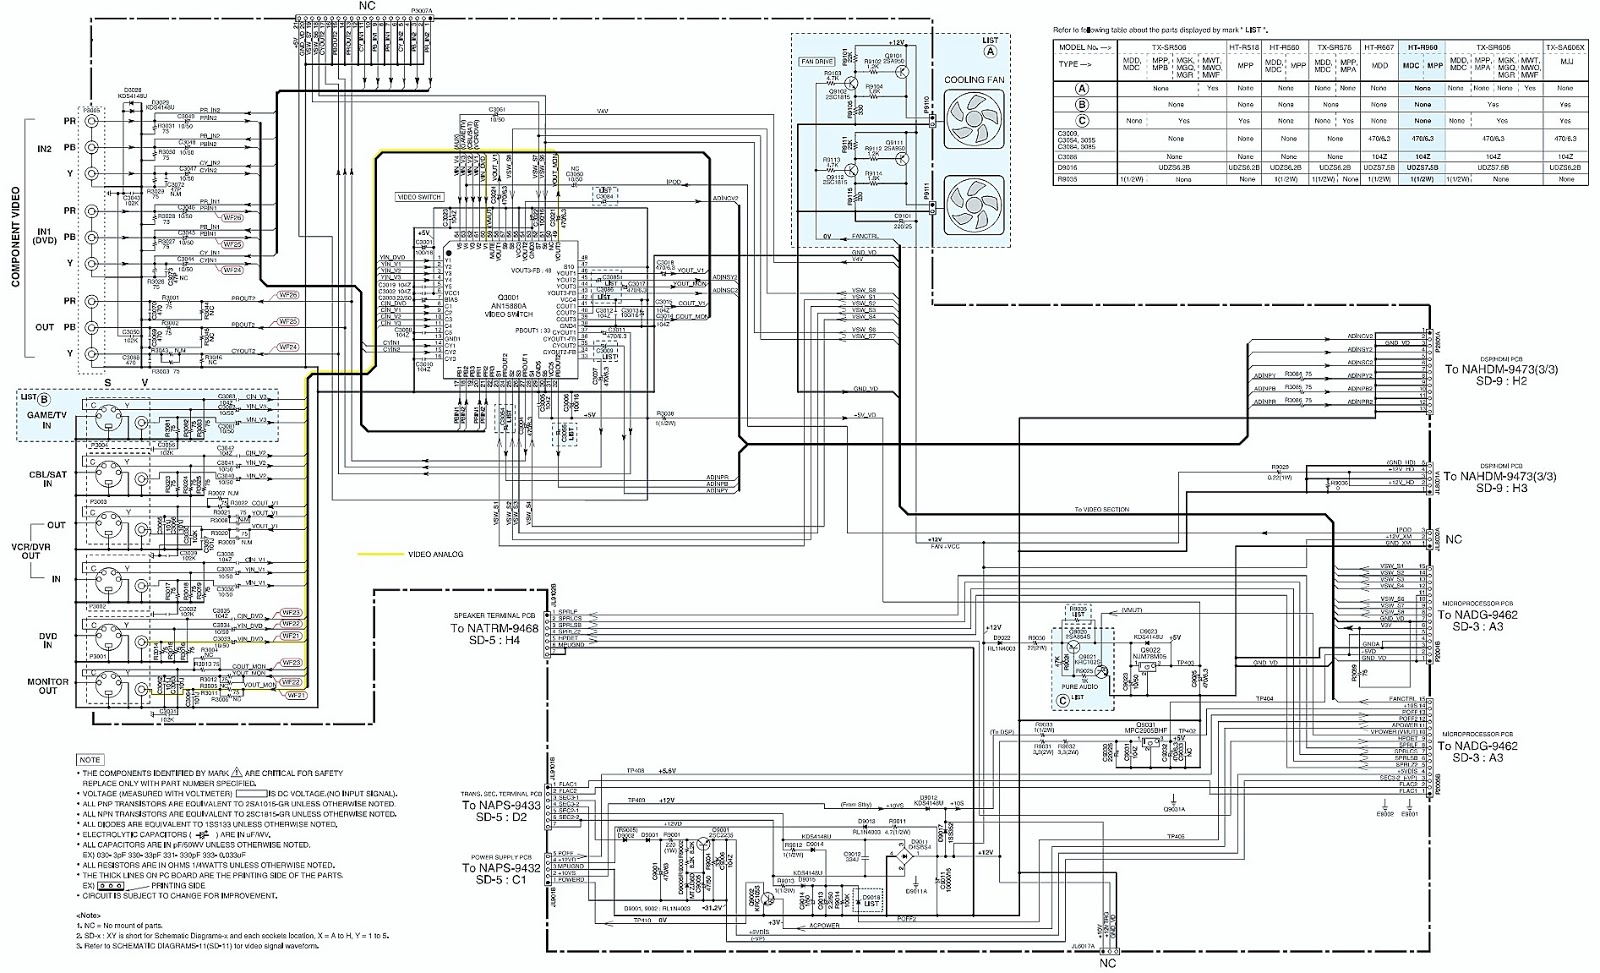 Onkyo Ht R960 7 1 Channel Htr Circuit Diagram